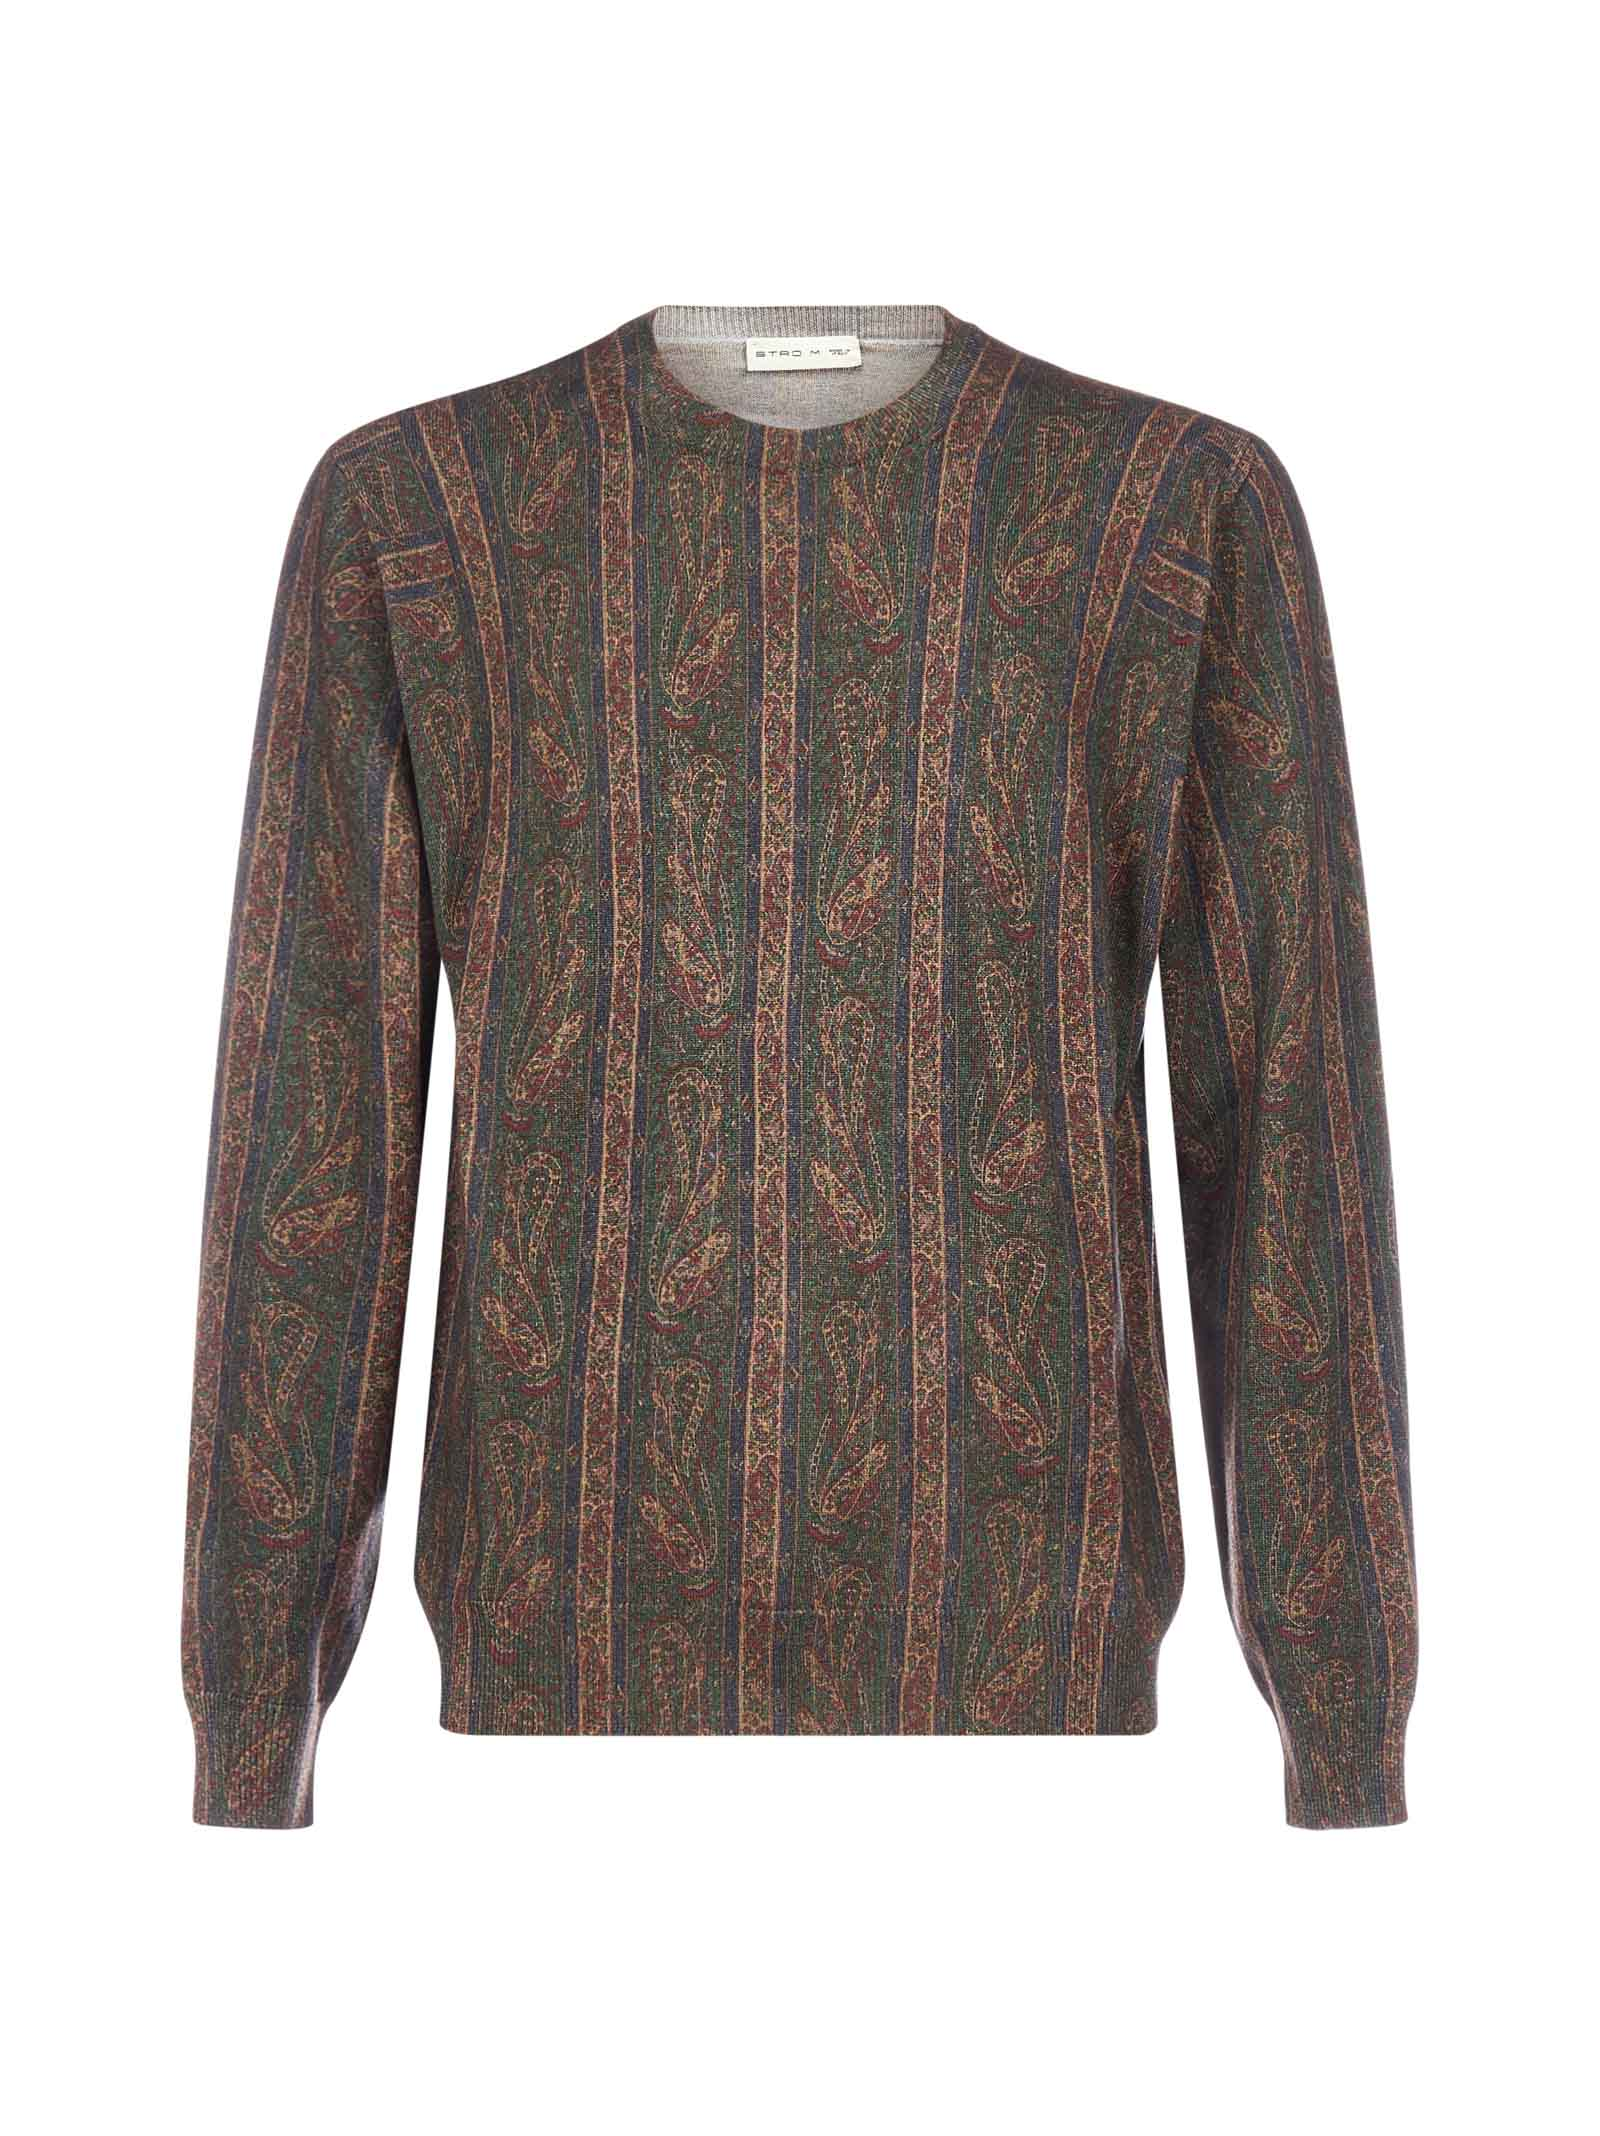 Etro Paisley Striped Wool Sweater